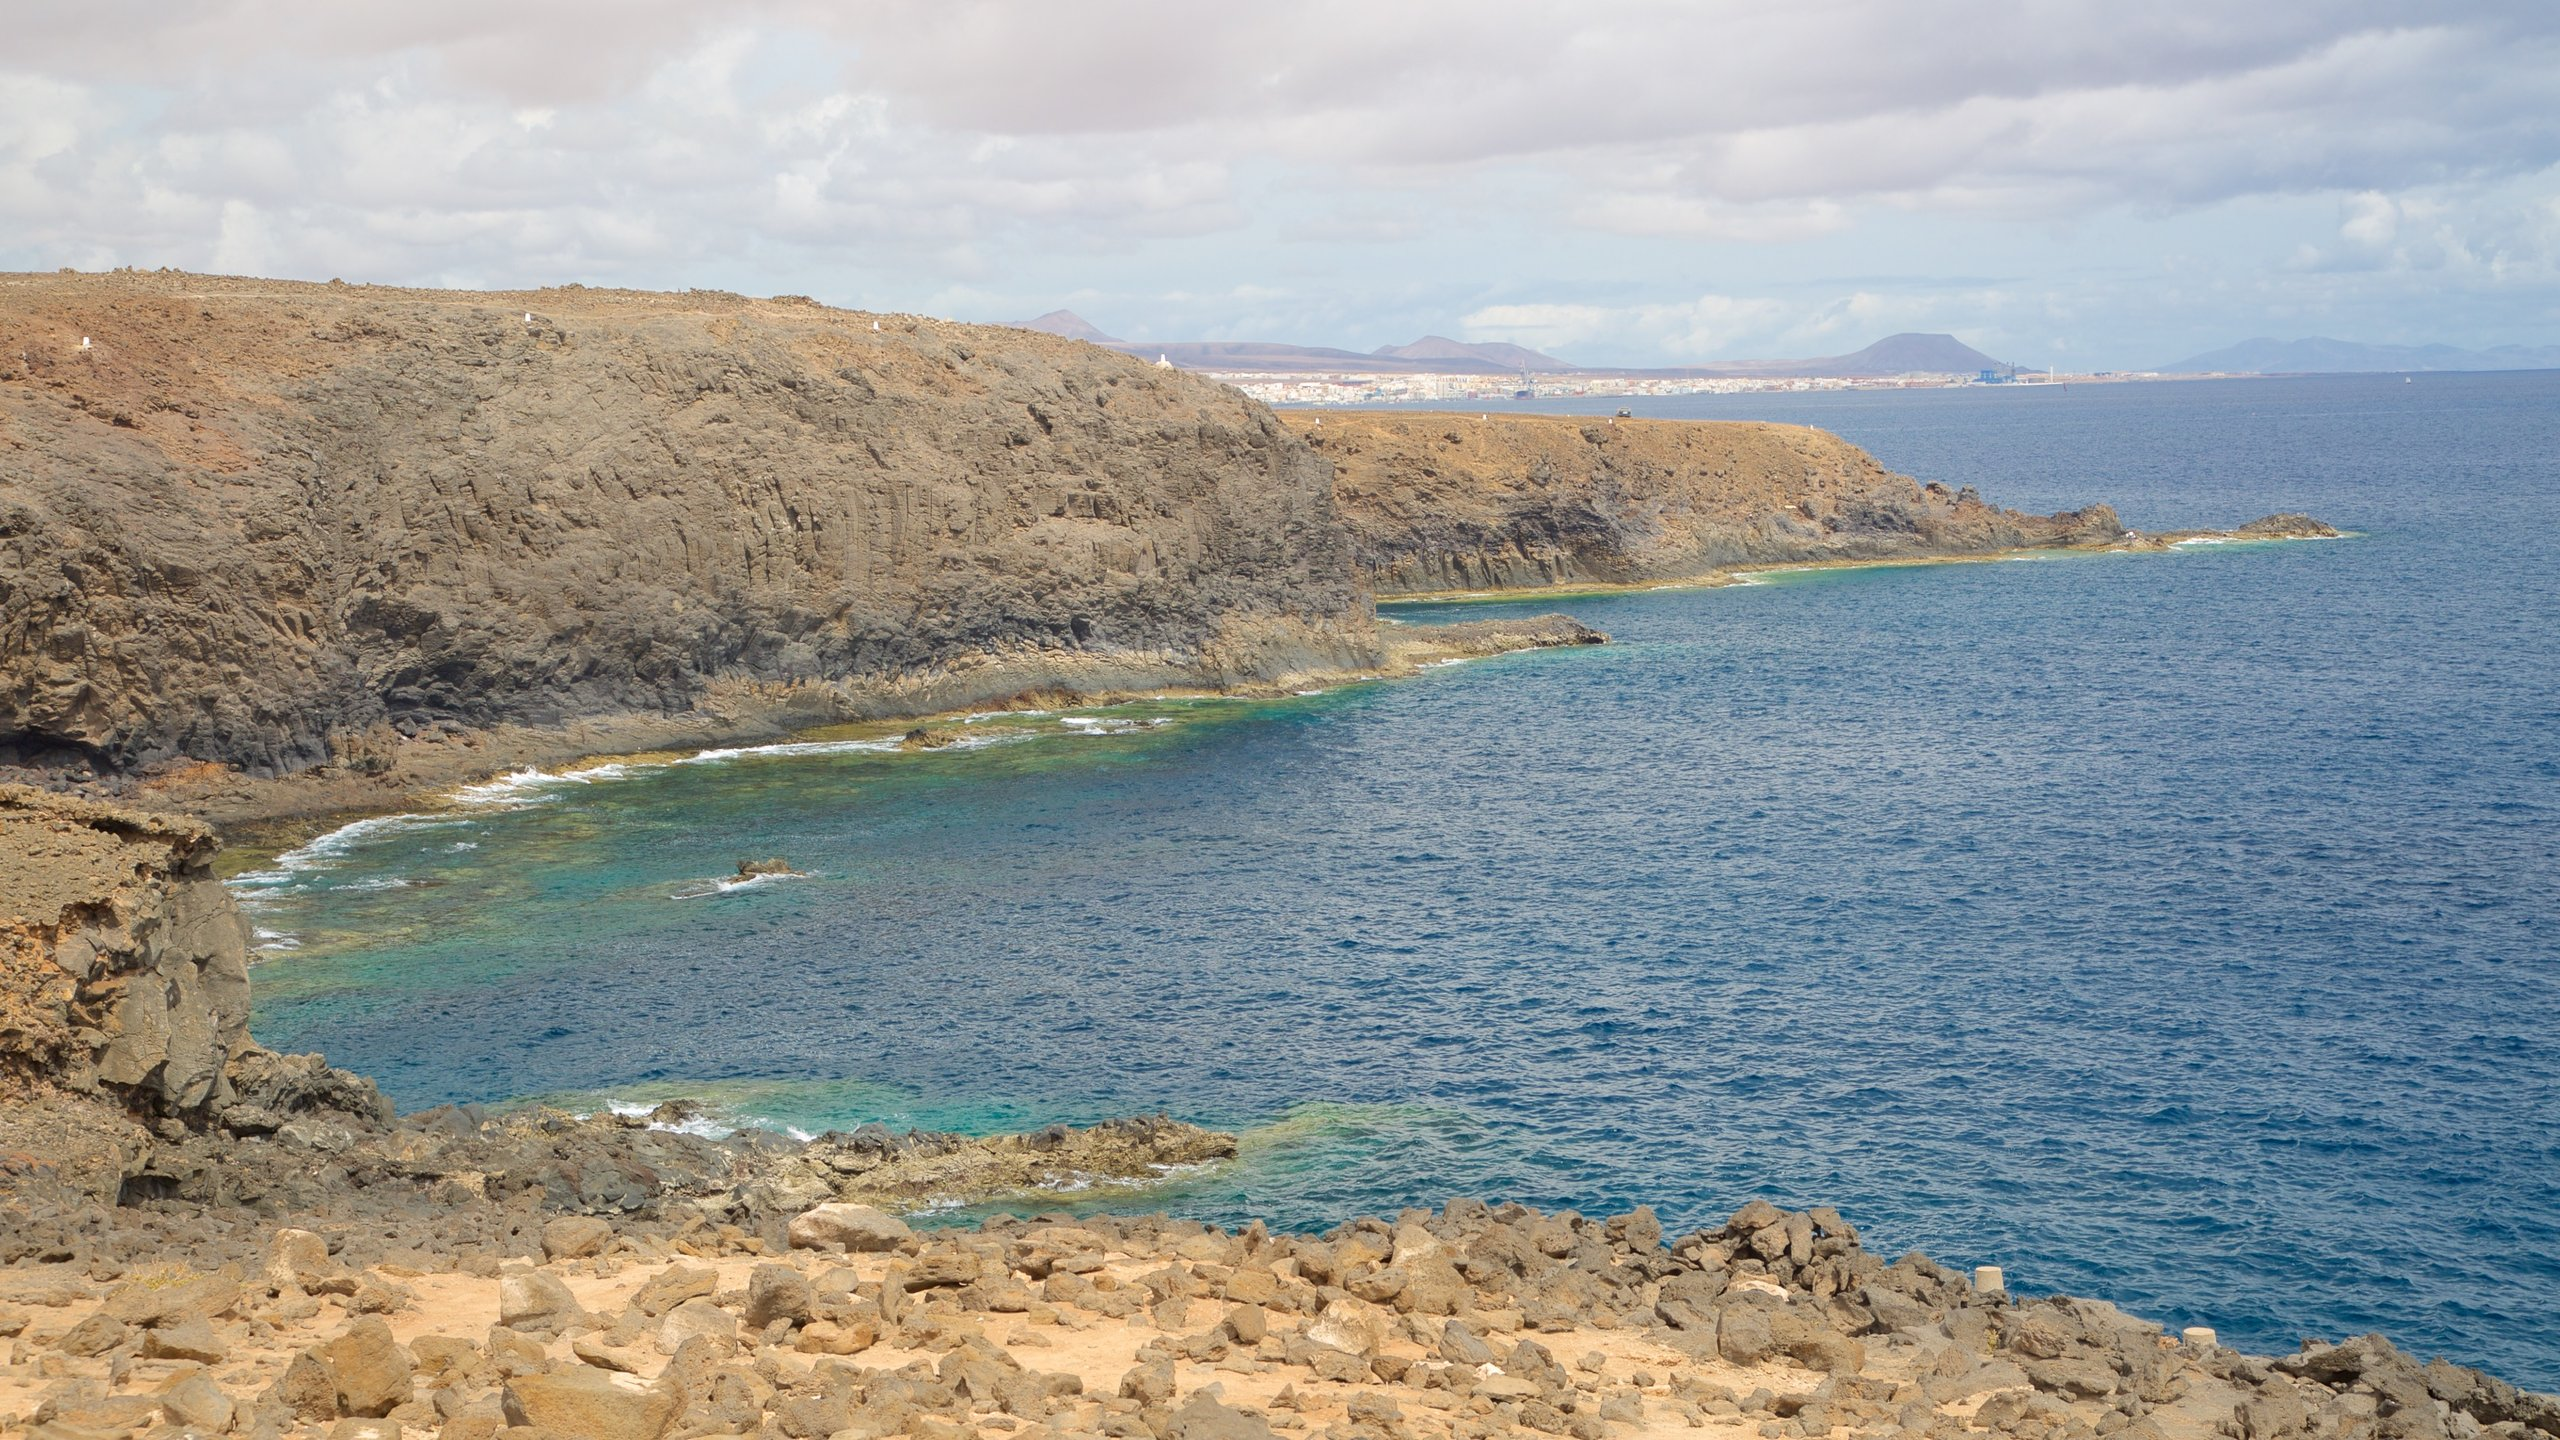 Costa de Antigua, Antigua, Canary Islands, Spain